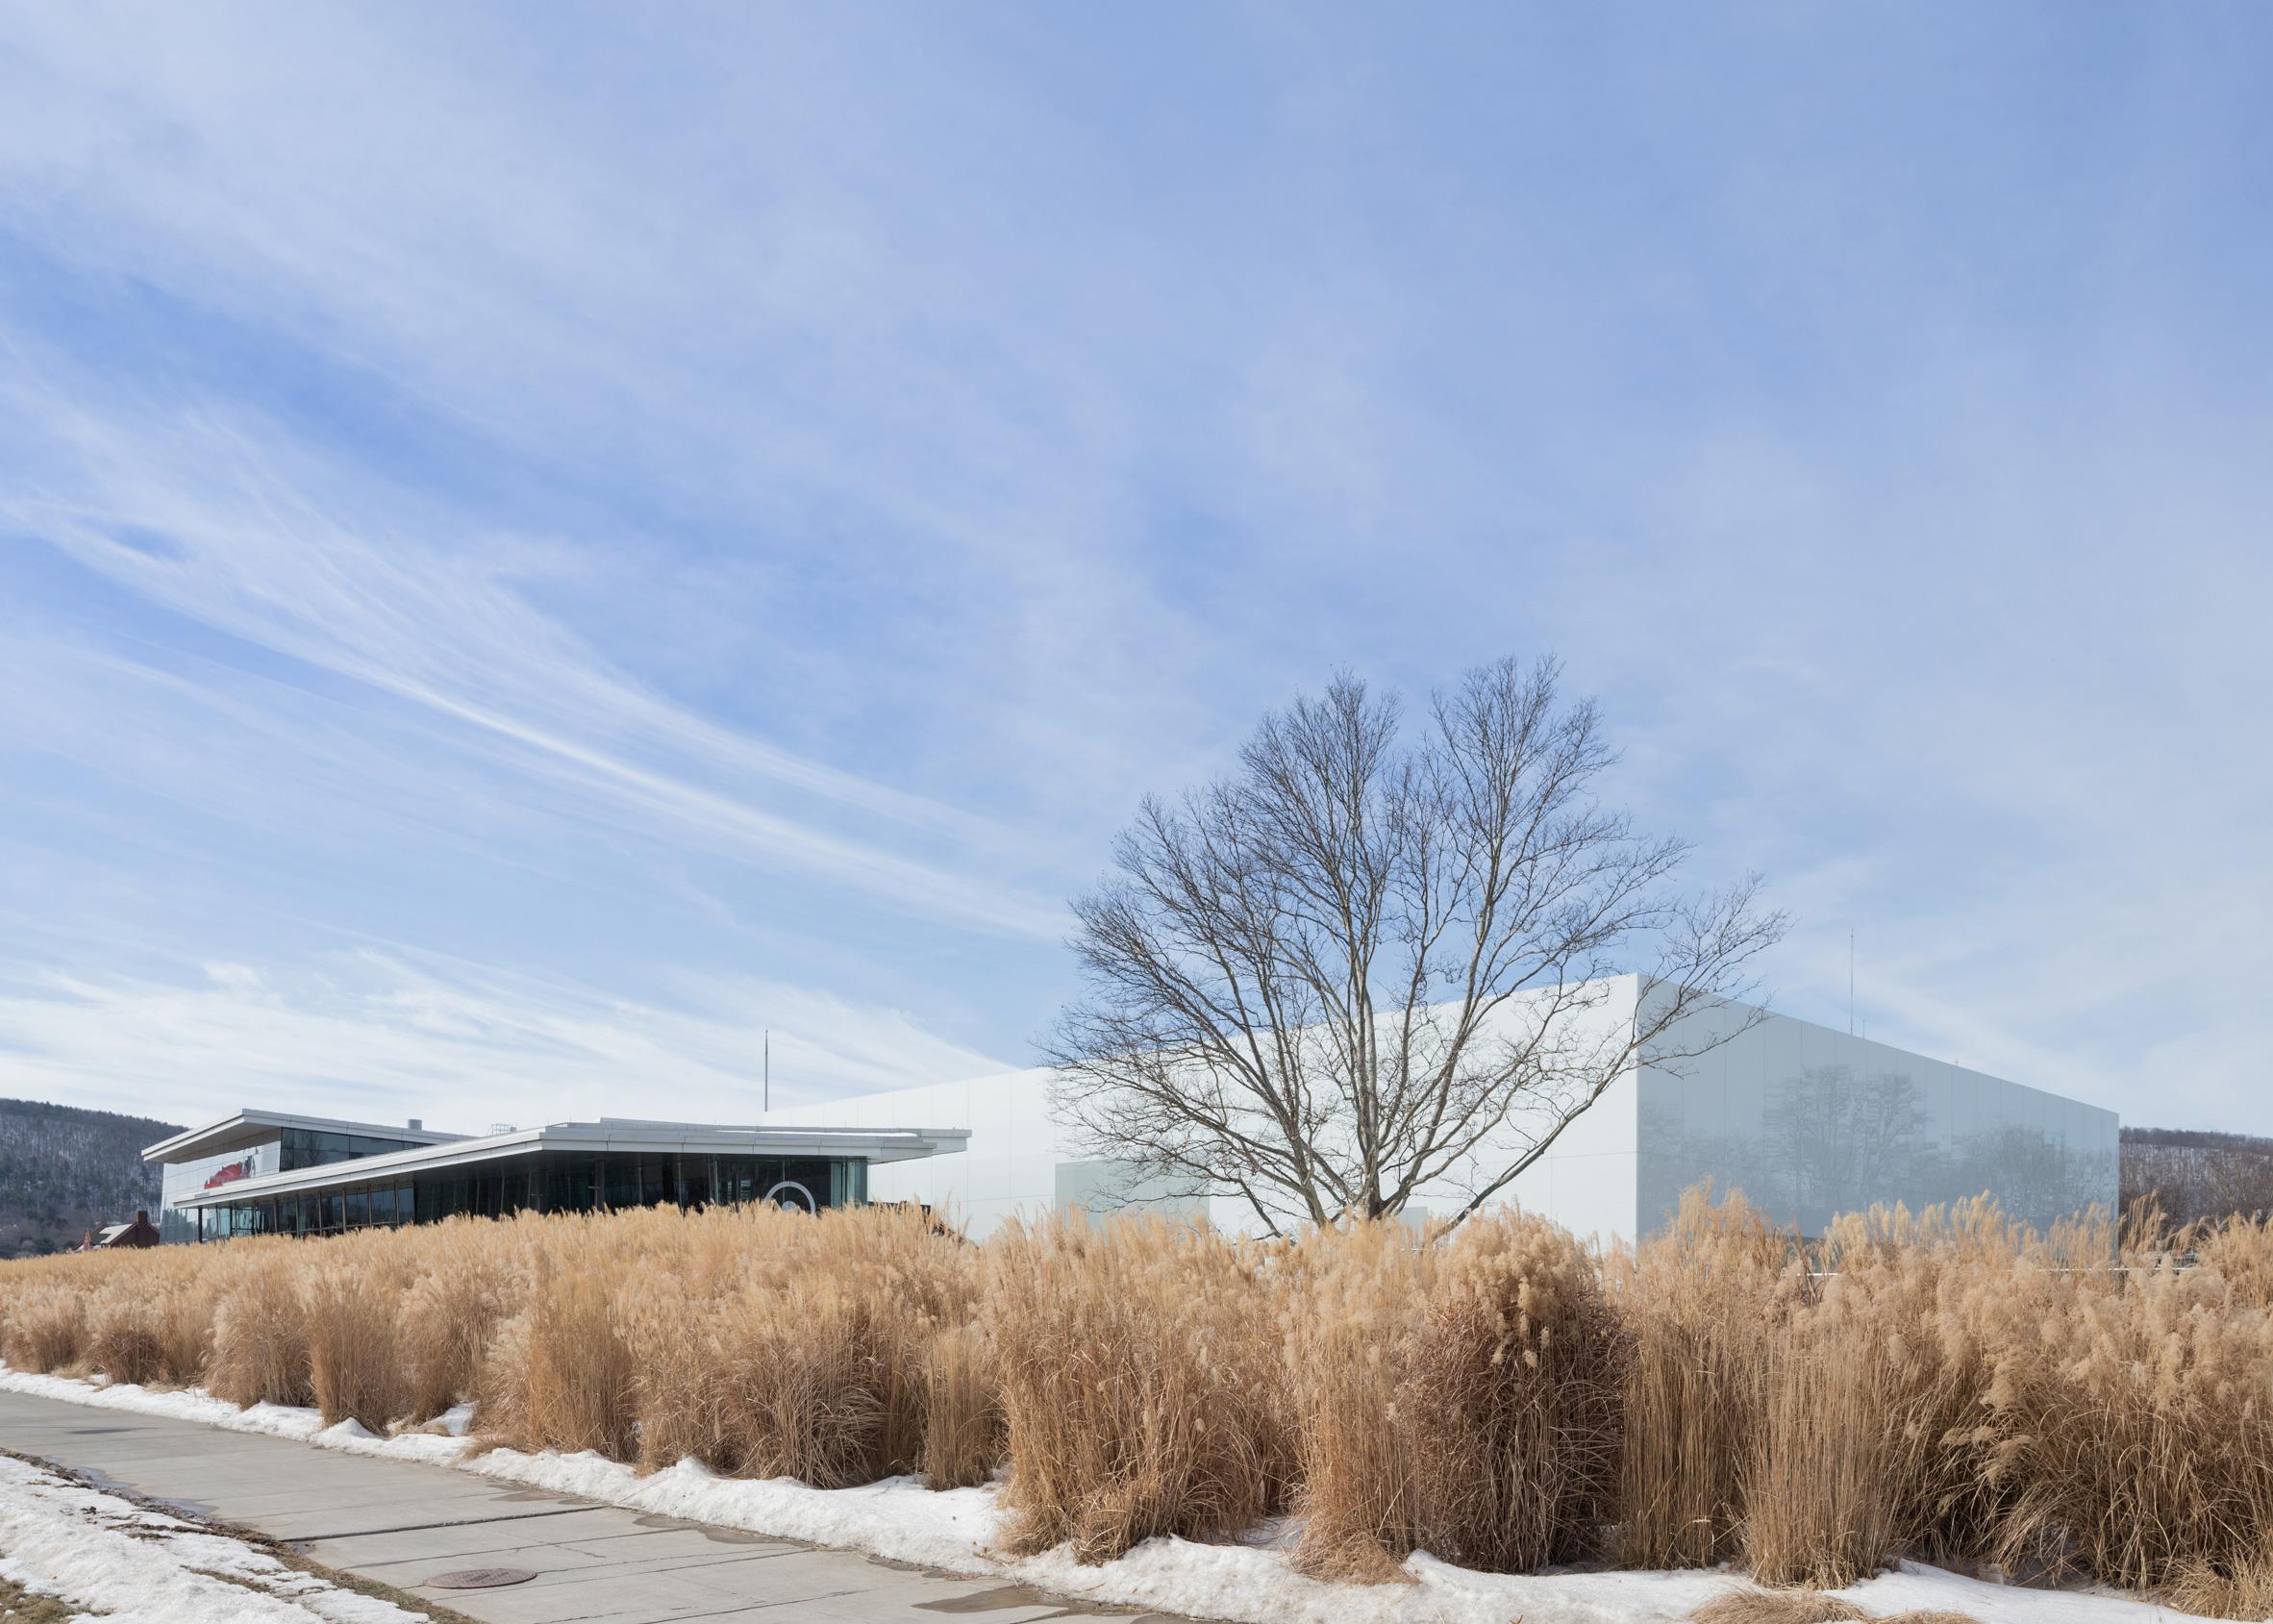 Corning Museum of Glass extension by Thomas Phifer, Corning, New York